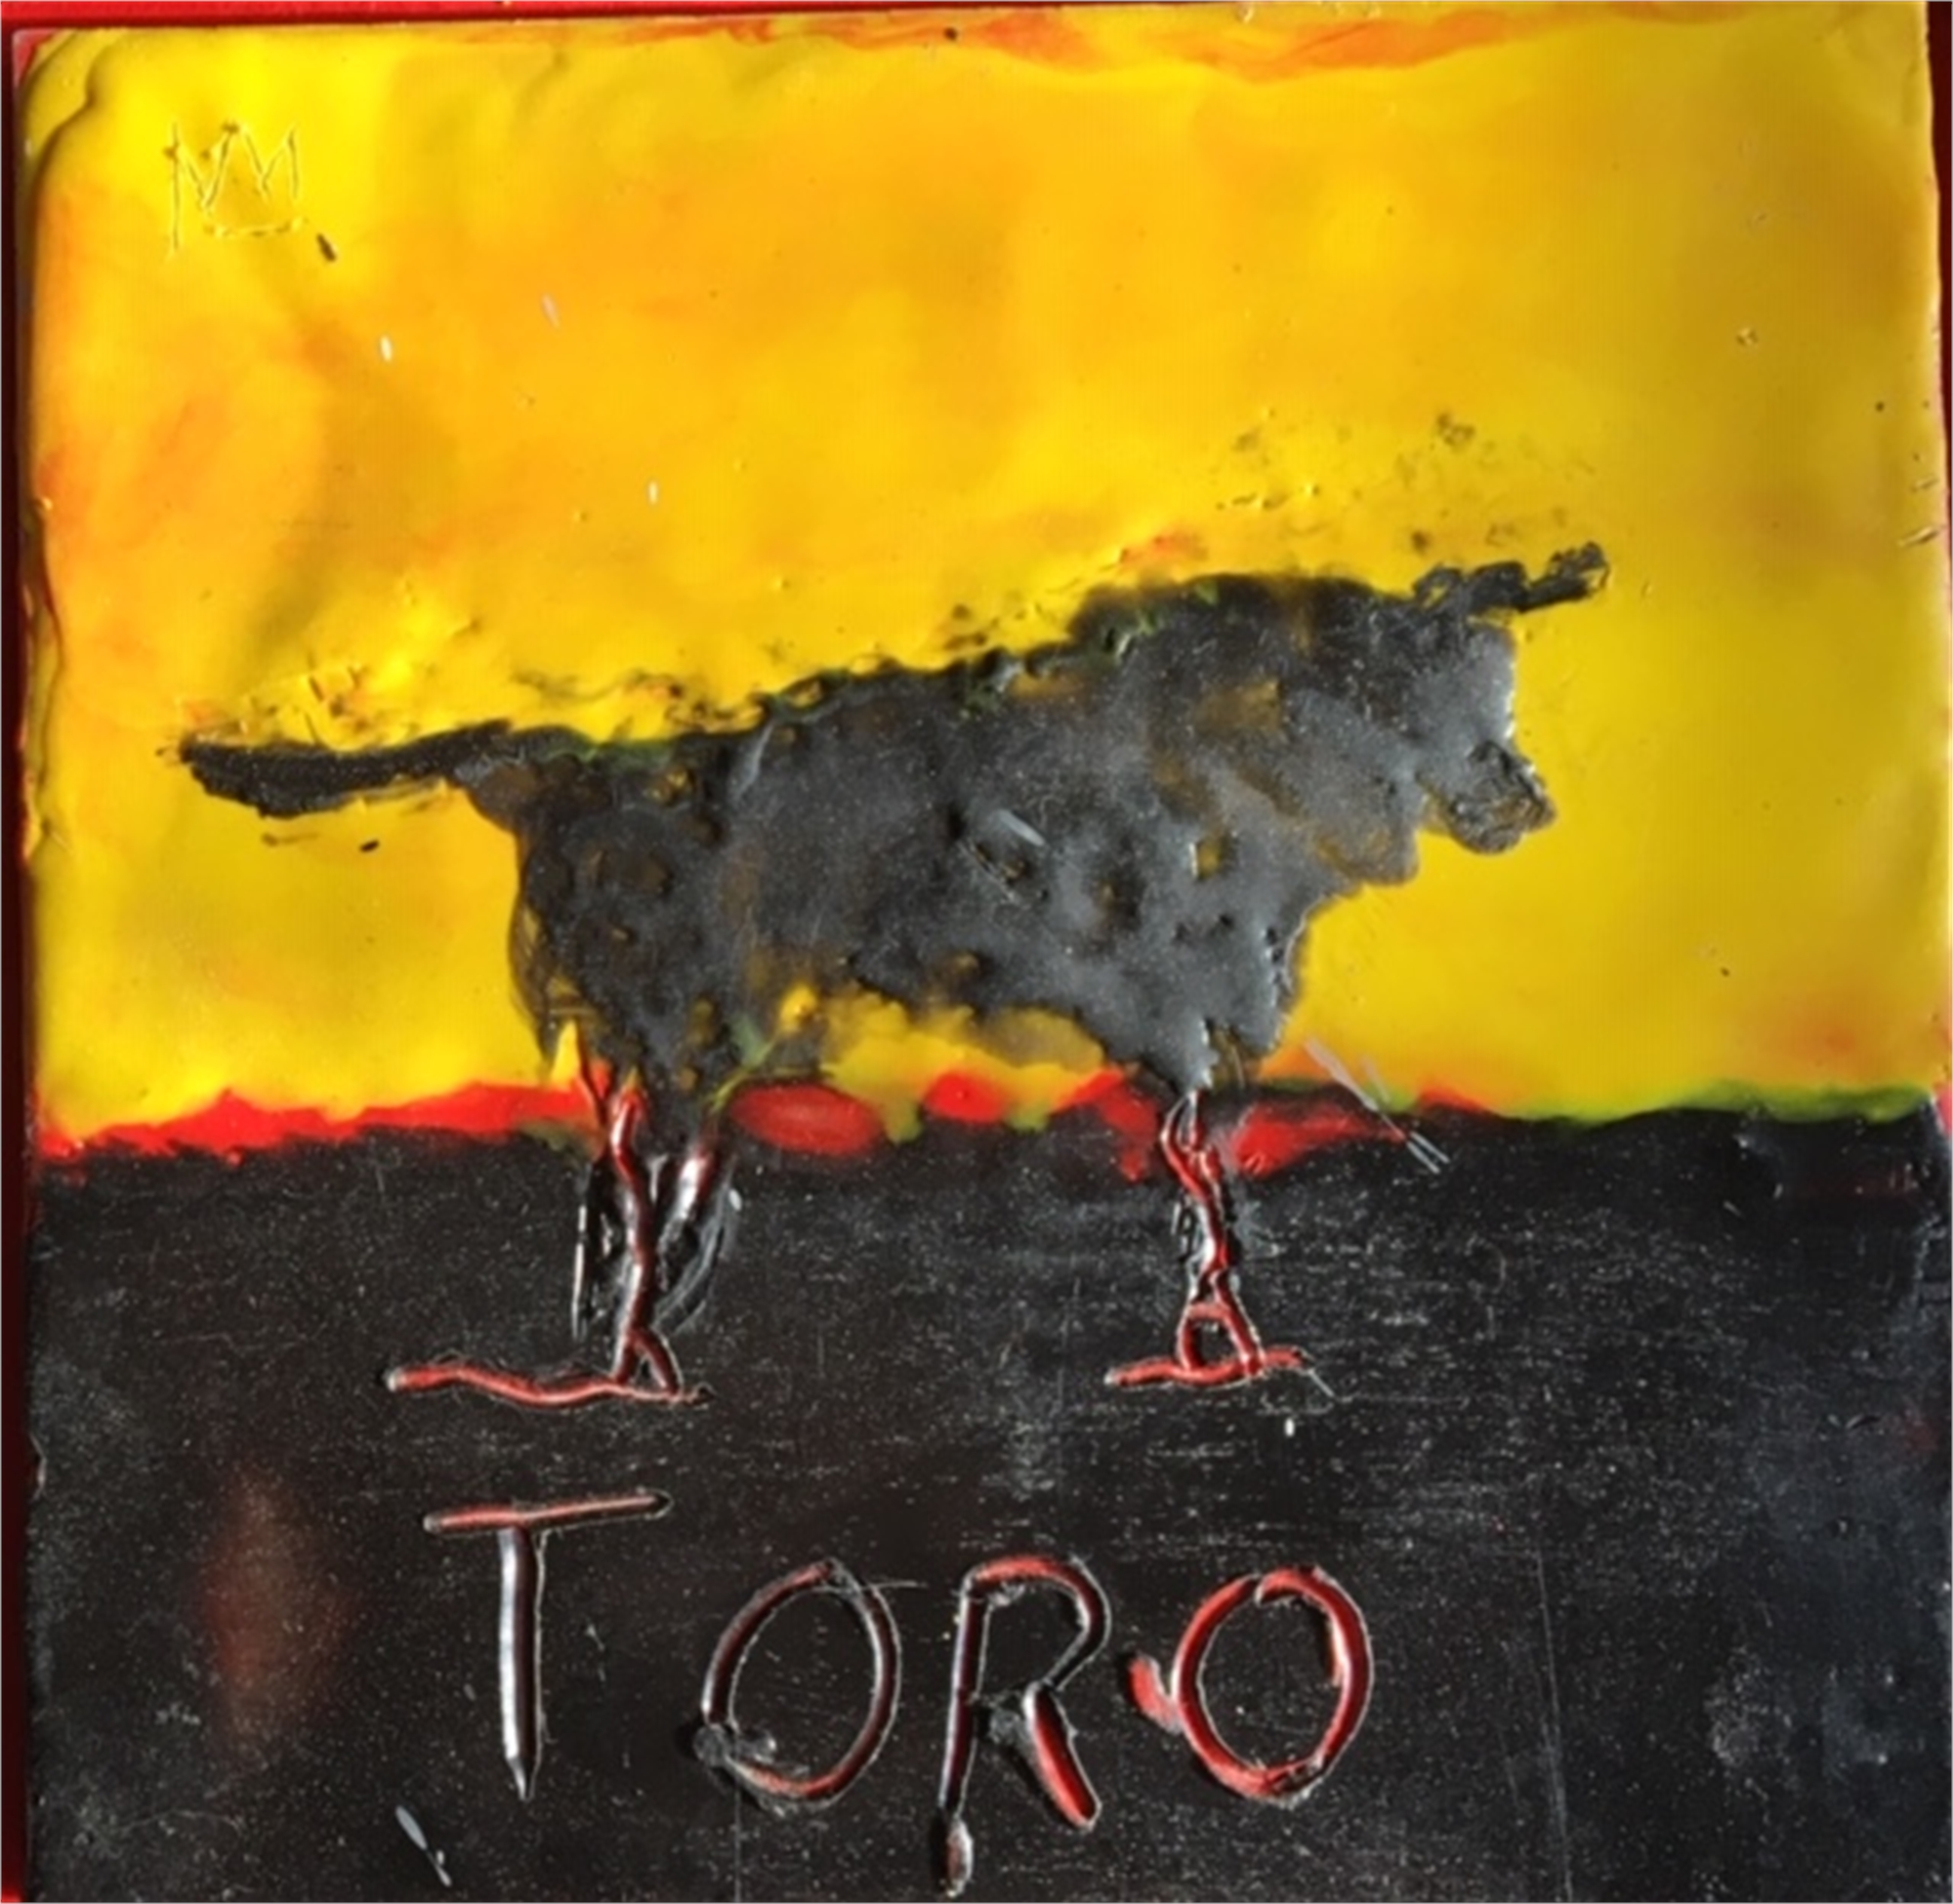 Toro by Michael Snodgrass